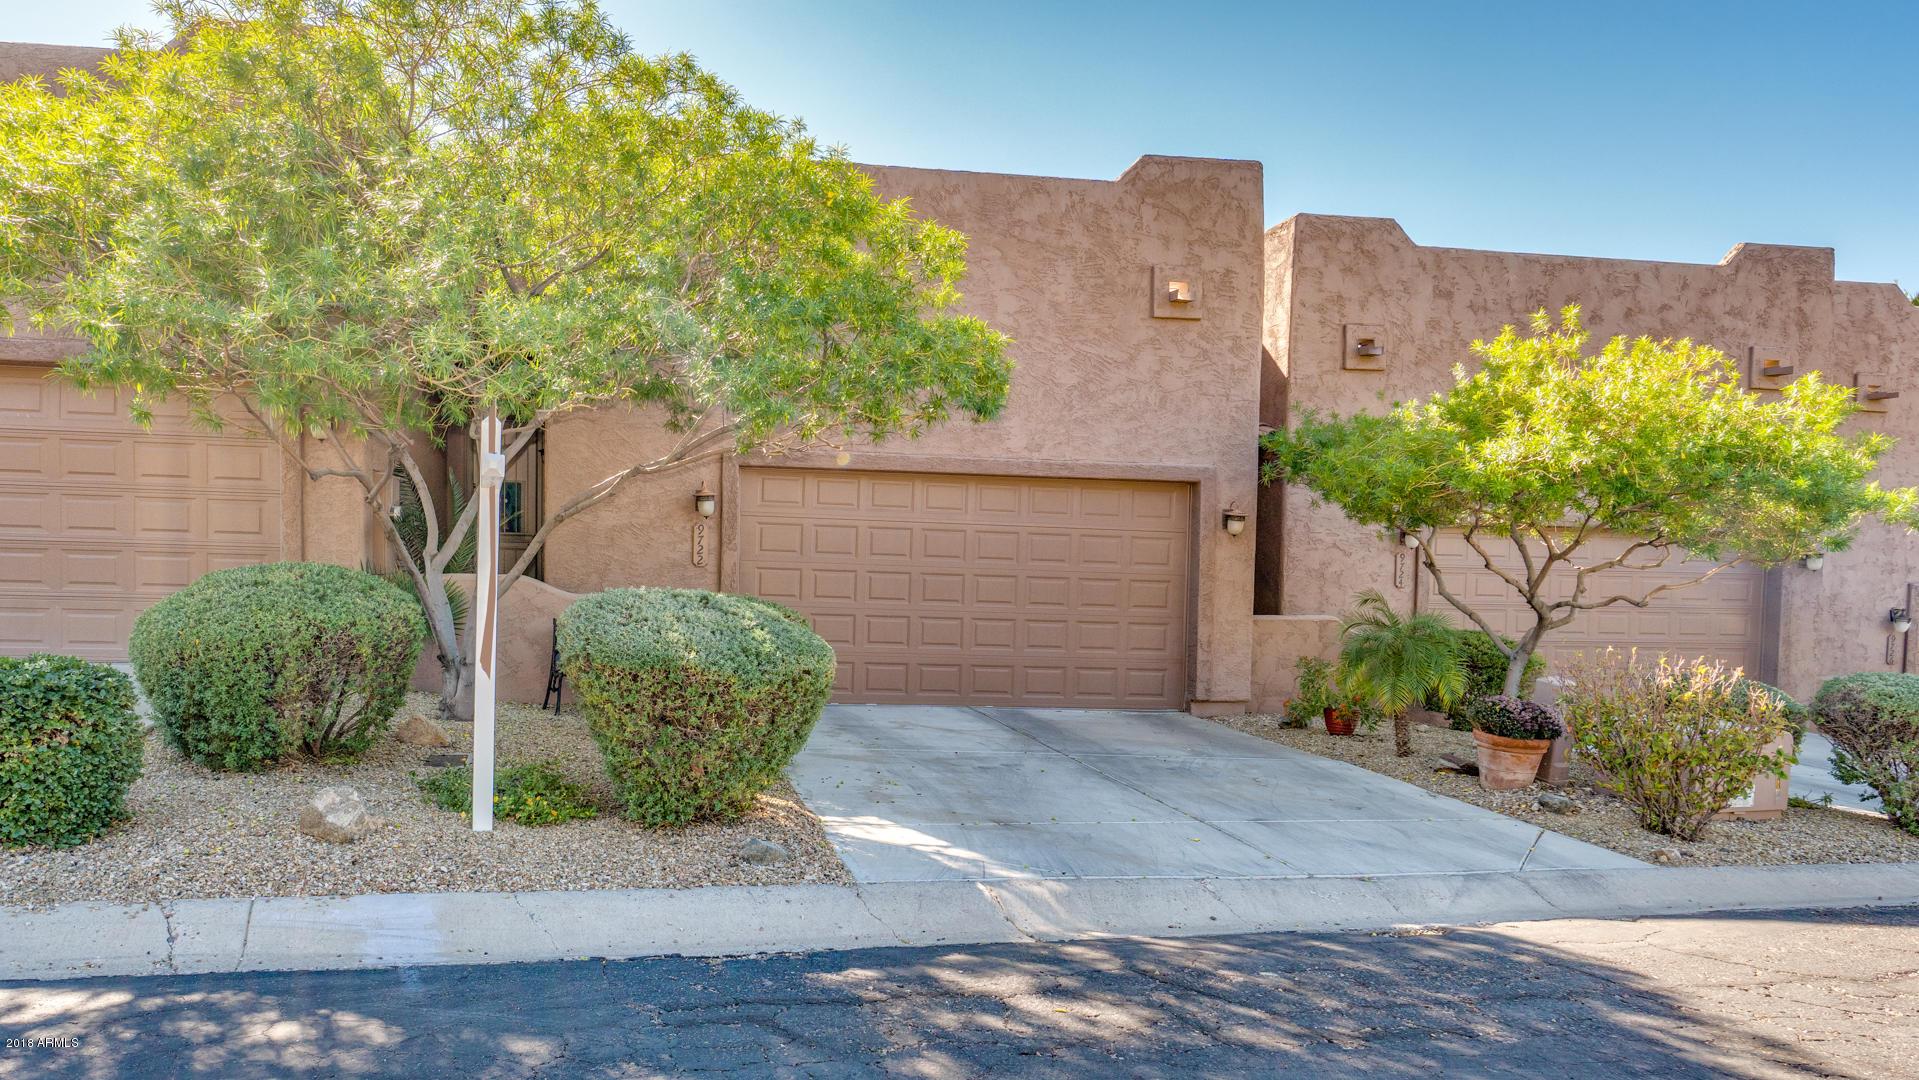 Photo of 9722 N 3rd Drive, Phoenix, AZ 85021